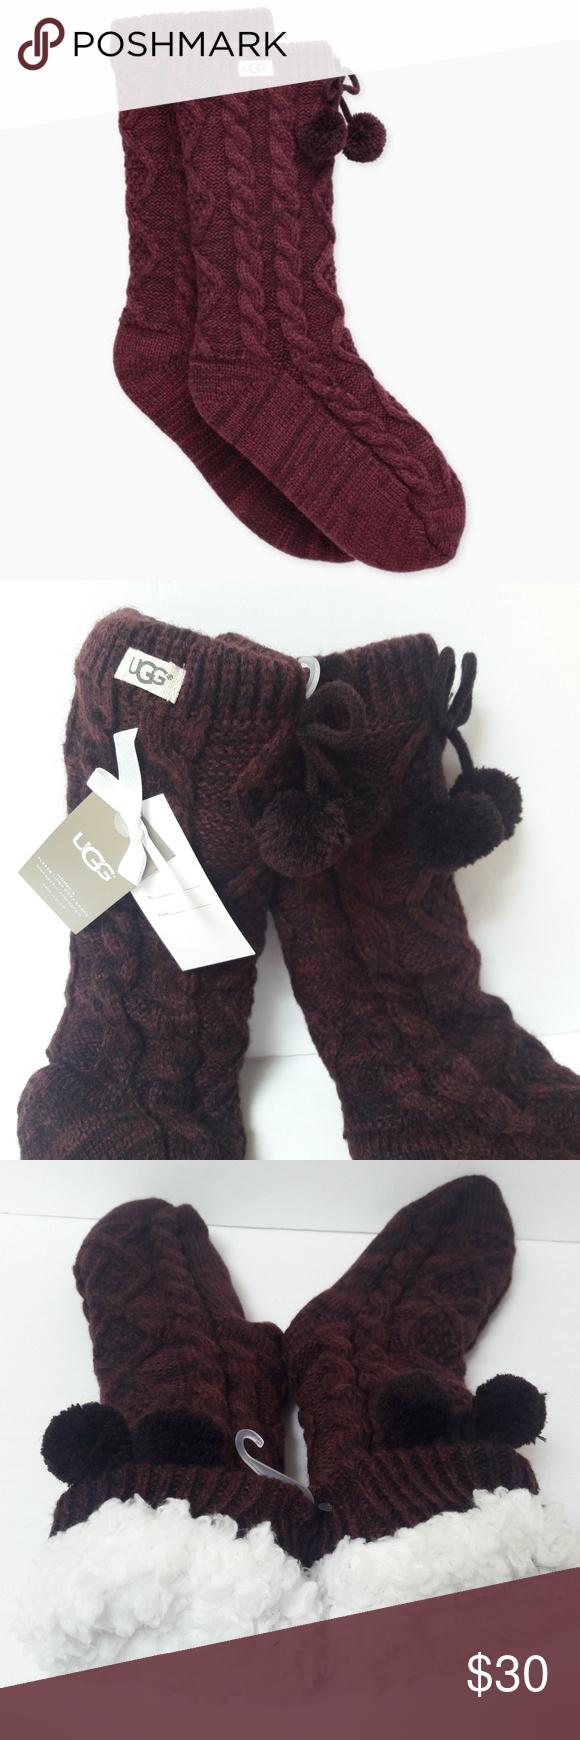 35465fbc82a New Burgundy UGG fleece lined Cozy Socks NWT in 2018 | My Posh Picks ...